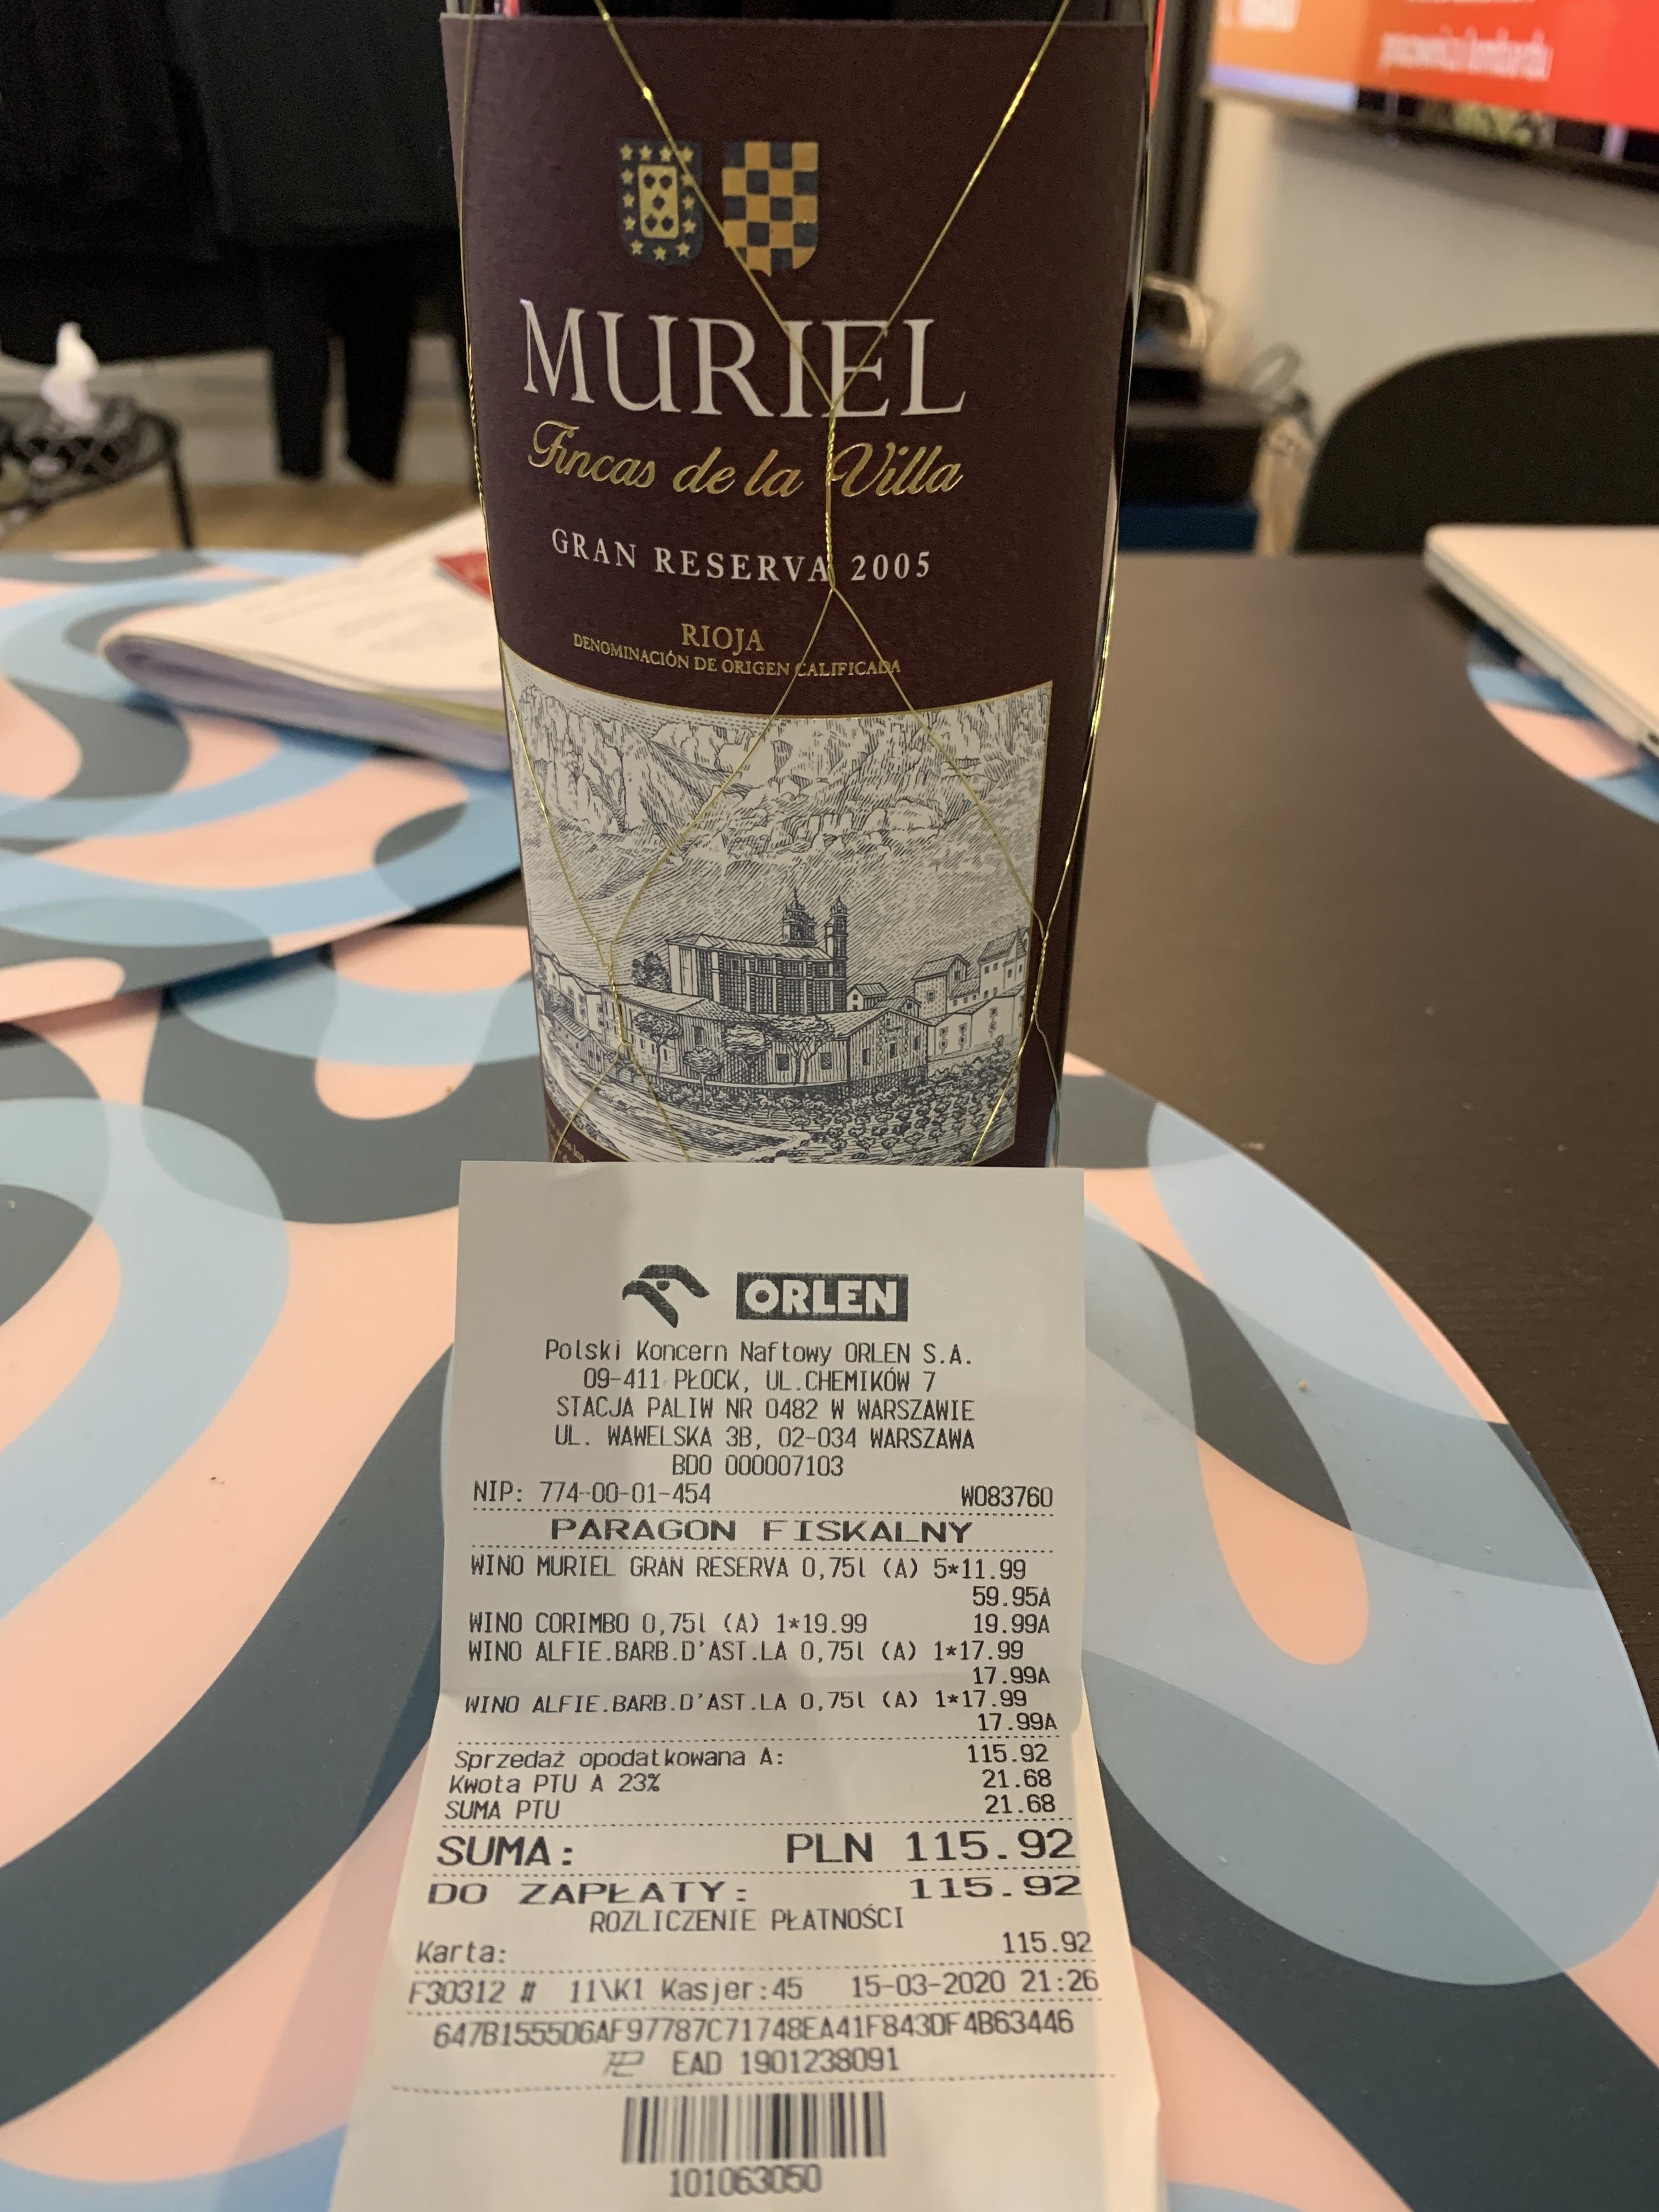 Wino Rioja Muriel Gran Reserva 2005 @Orlen Warszawa